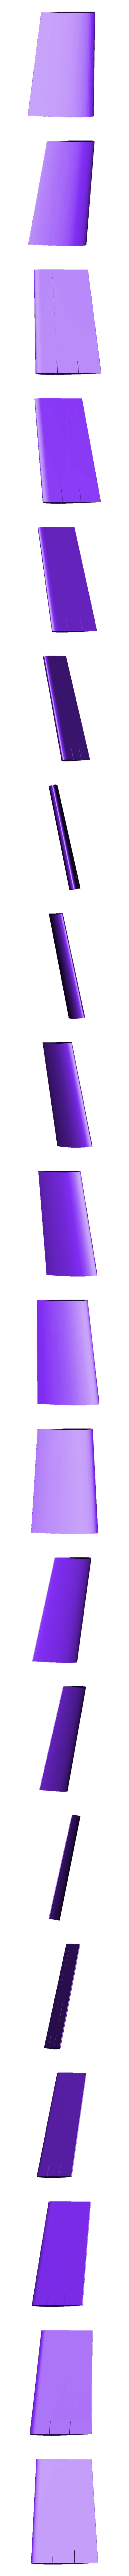 Thick_Wing_Left_Inner.stl Download free STL file Flyer Mk. 1 • 3D printing object, billbo1958